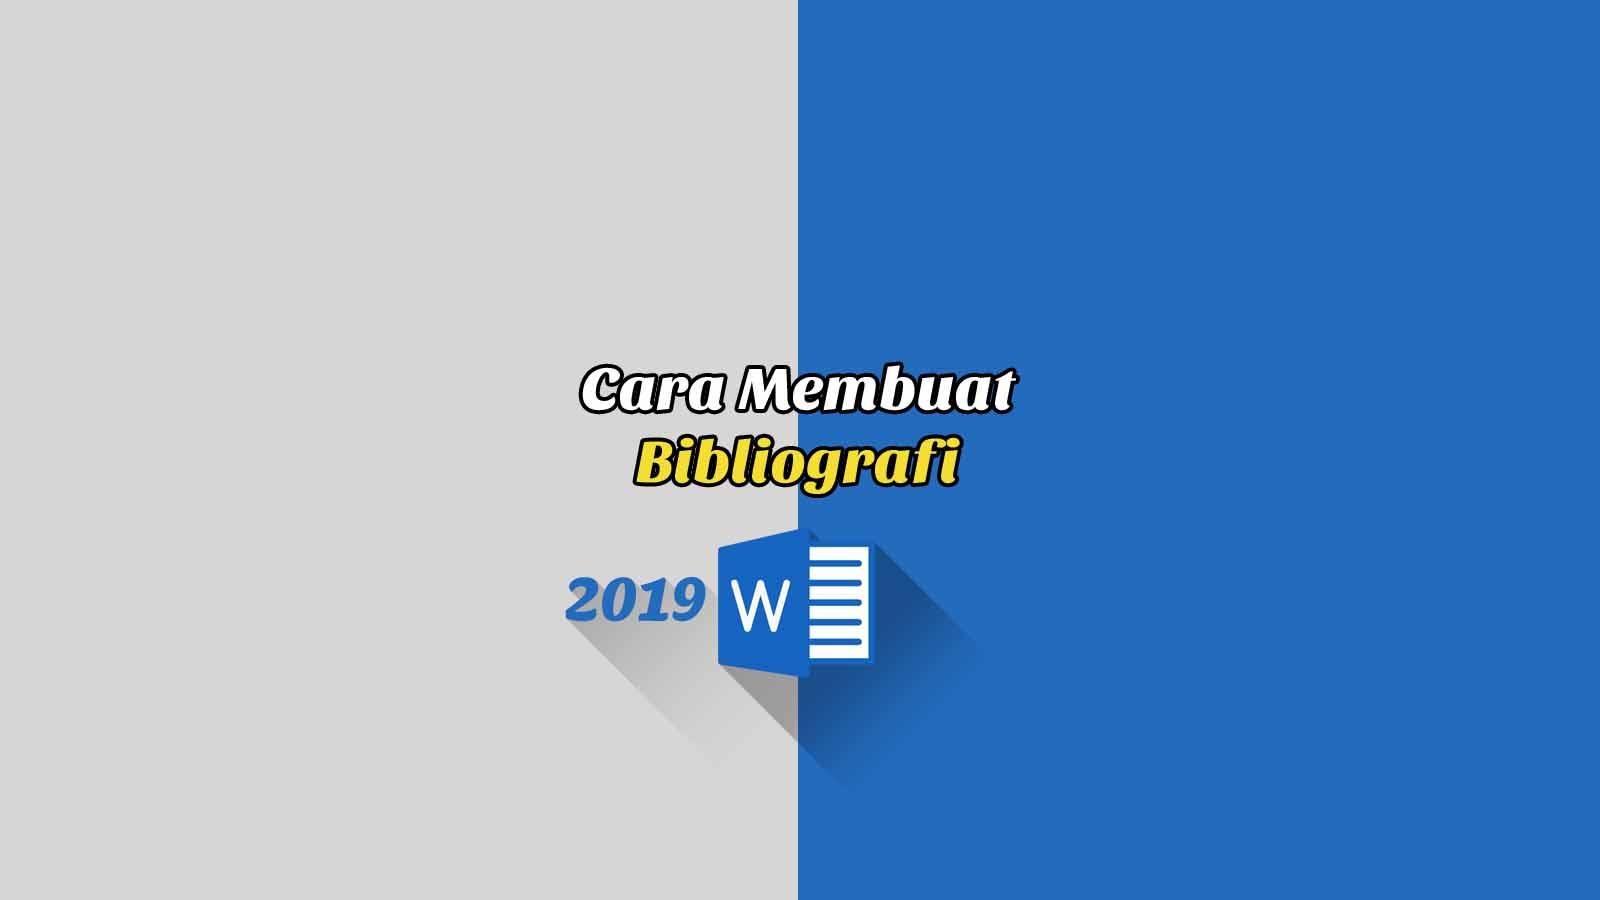 Cara Membuat Bibliografi (Daftar Pustaka) - Word 2019